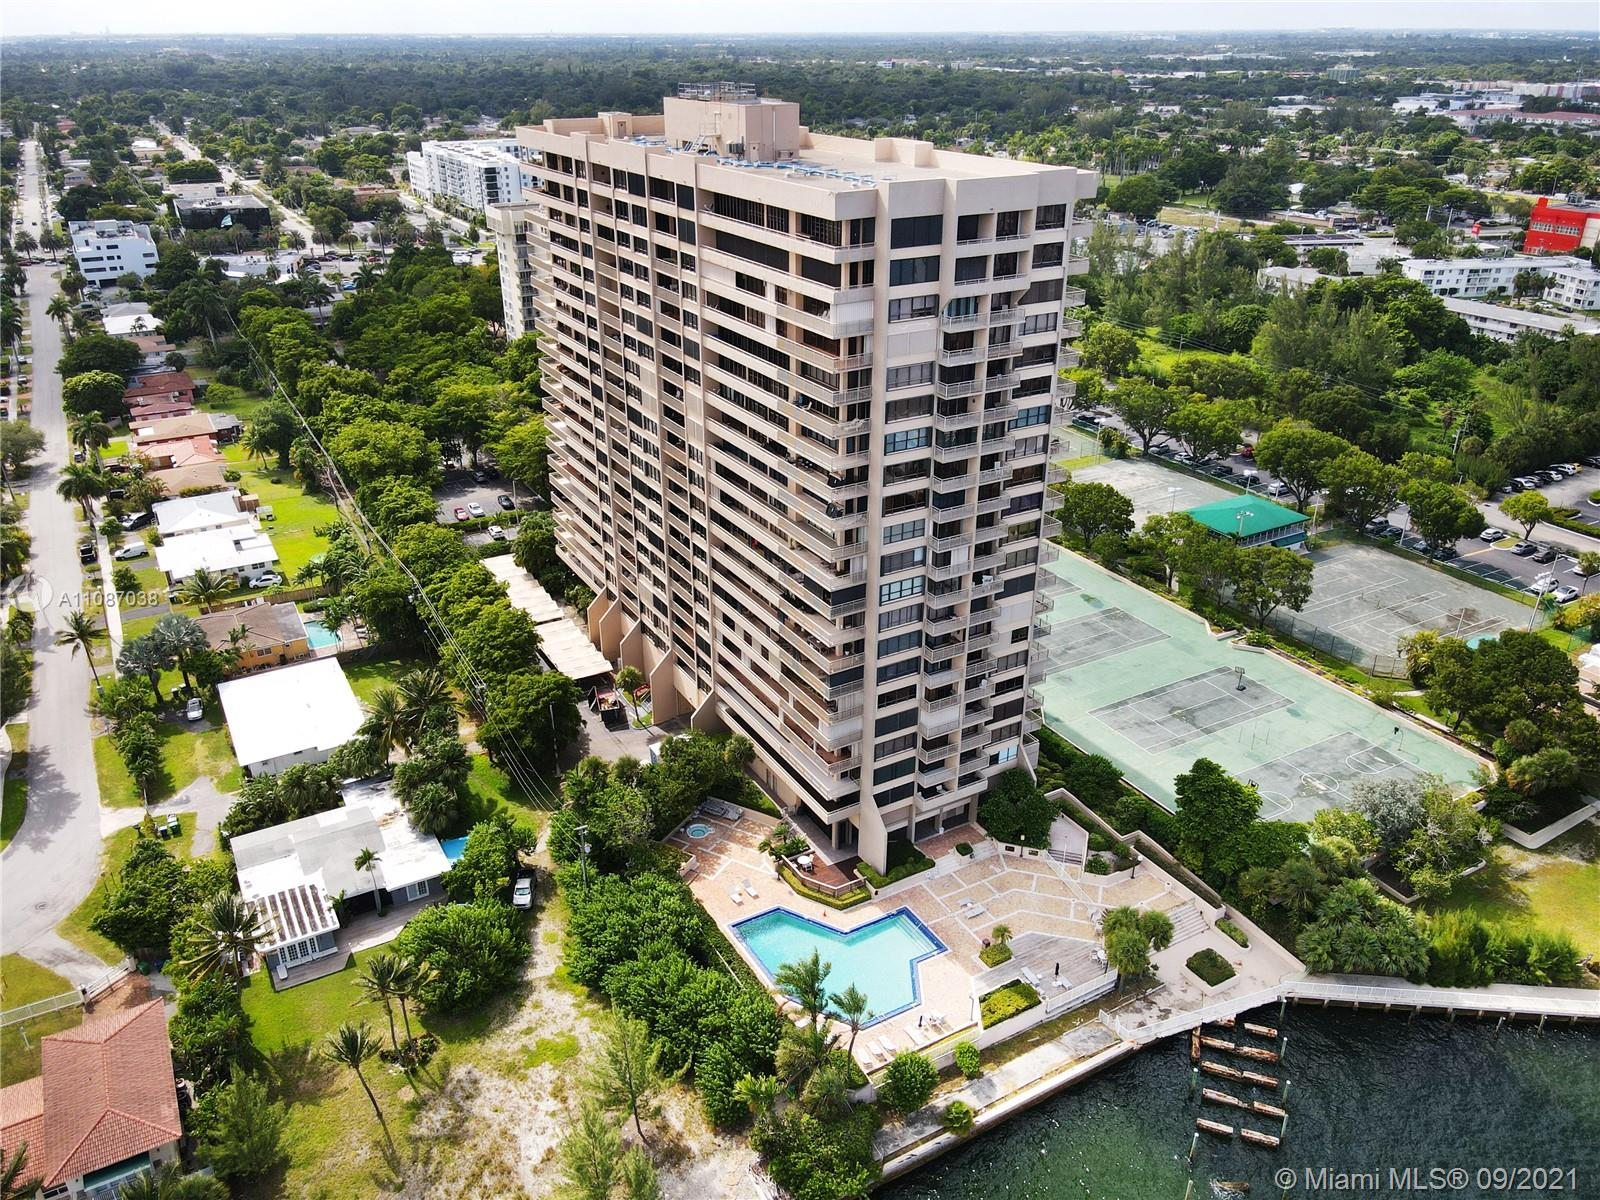 11113 Biscayne Blvd Unit 1756, North Miami, Florida 33181